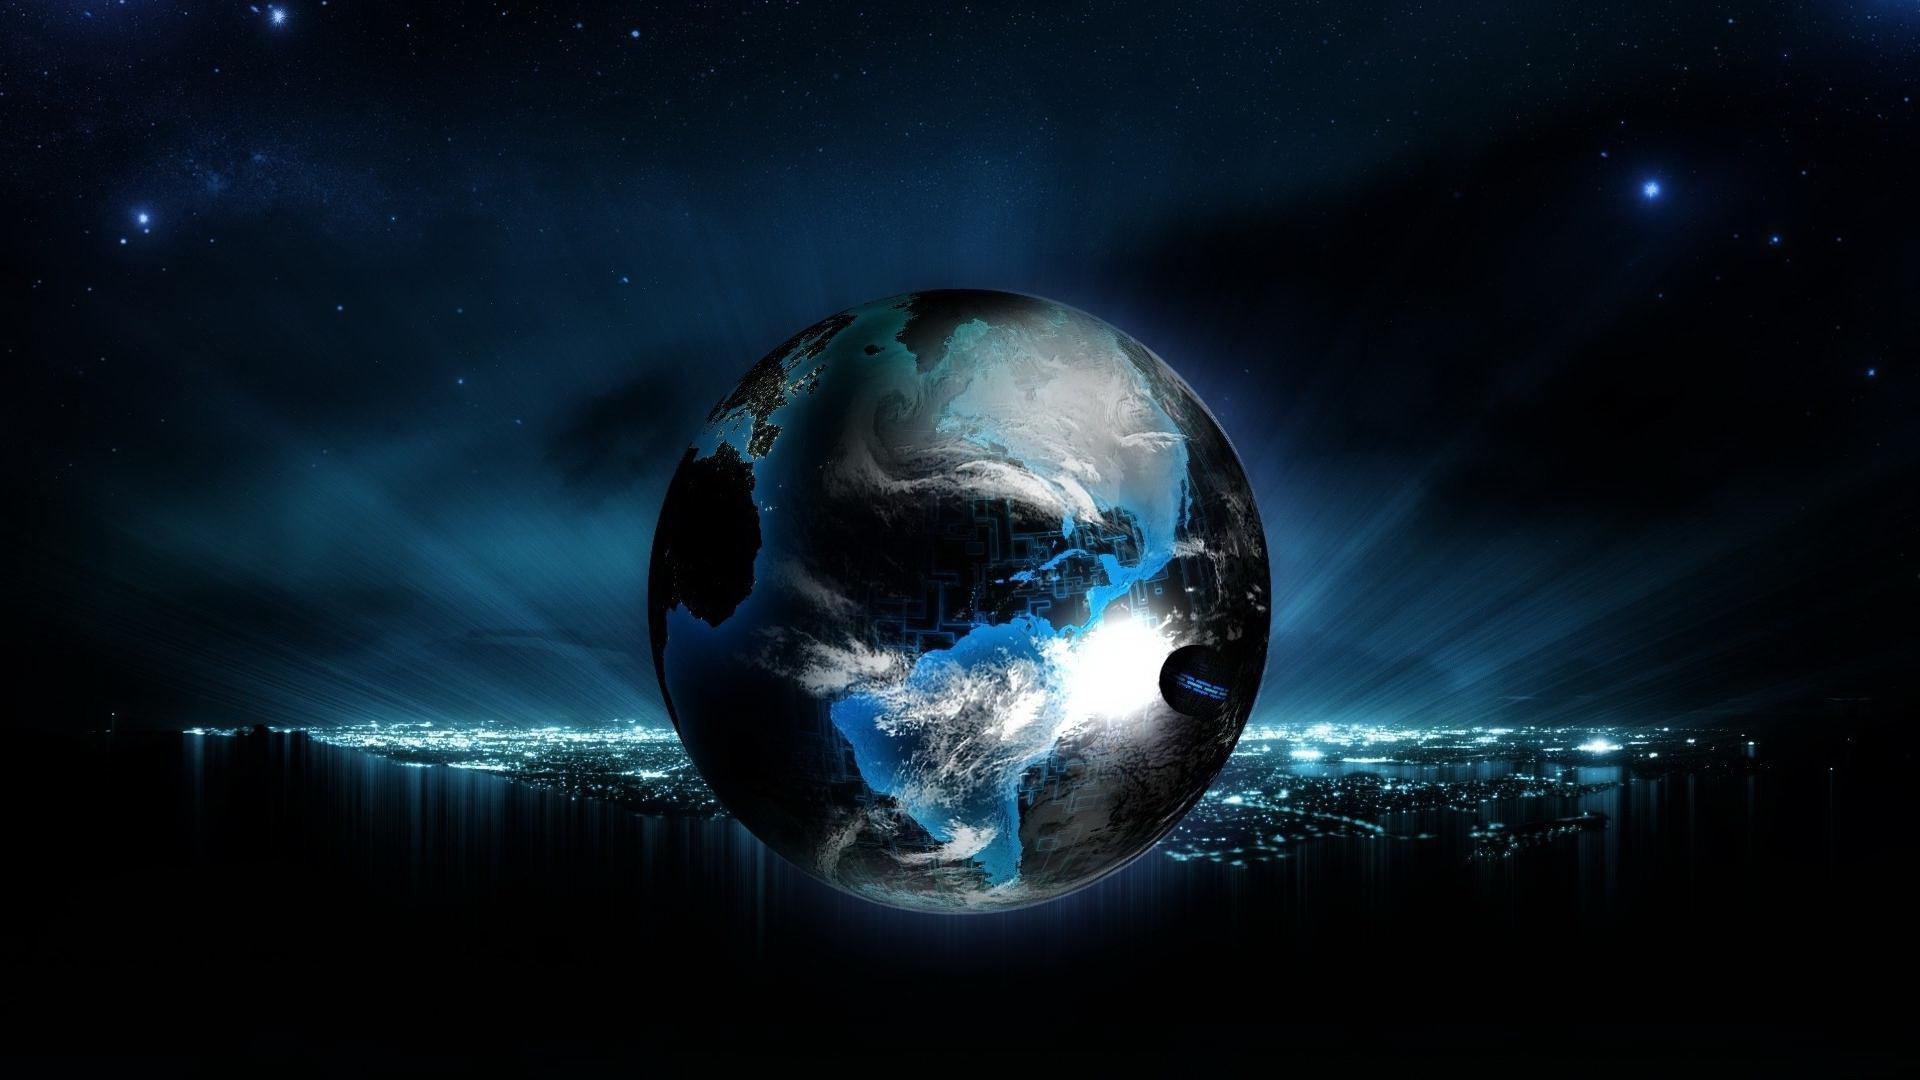 Space Live Wallpaper Free Download #18115 Wallpaper   Wallpaper hd